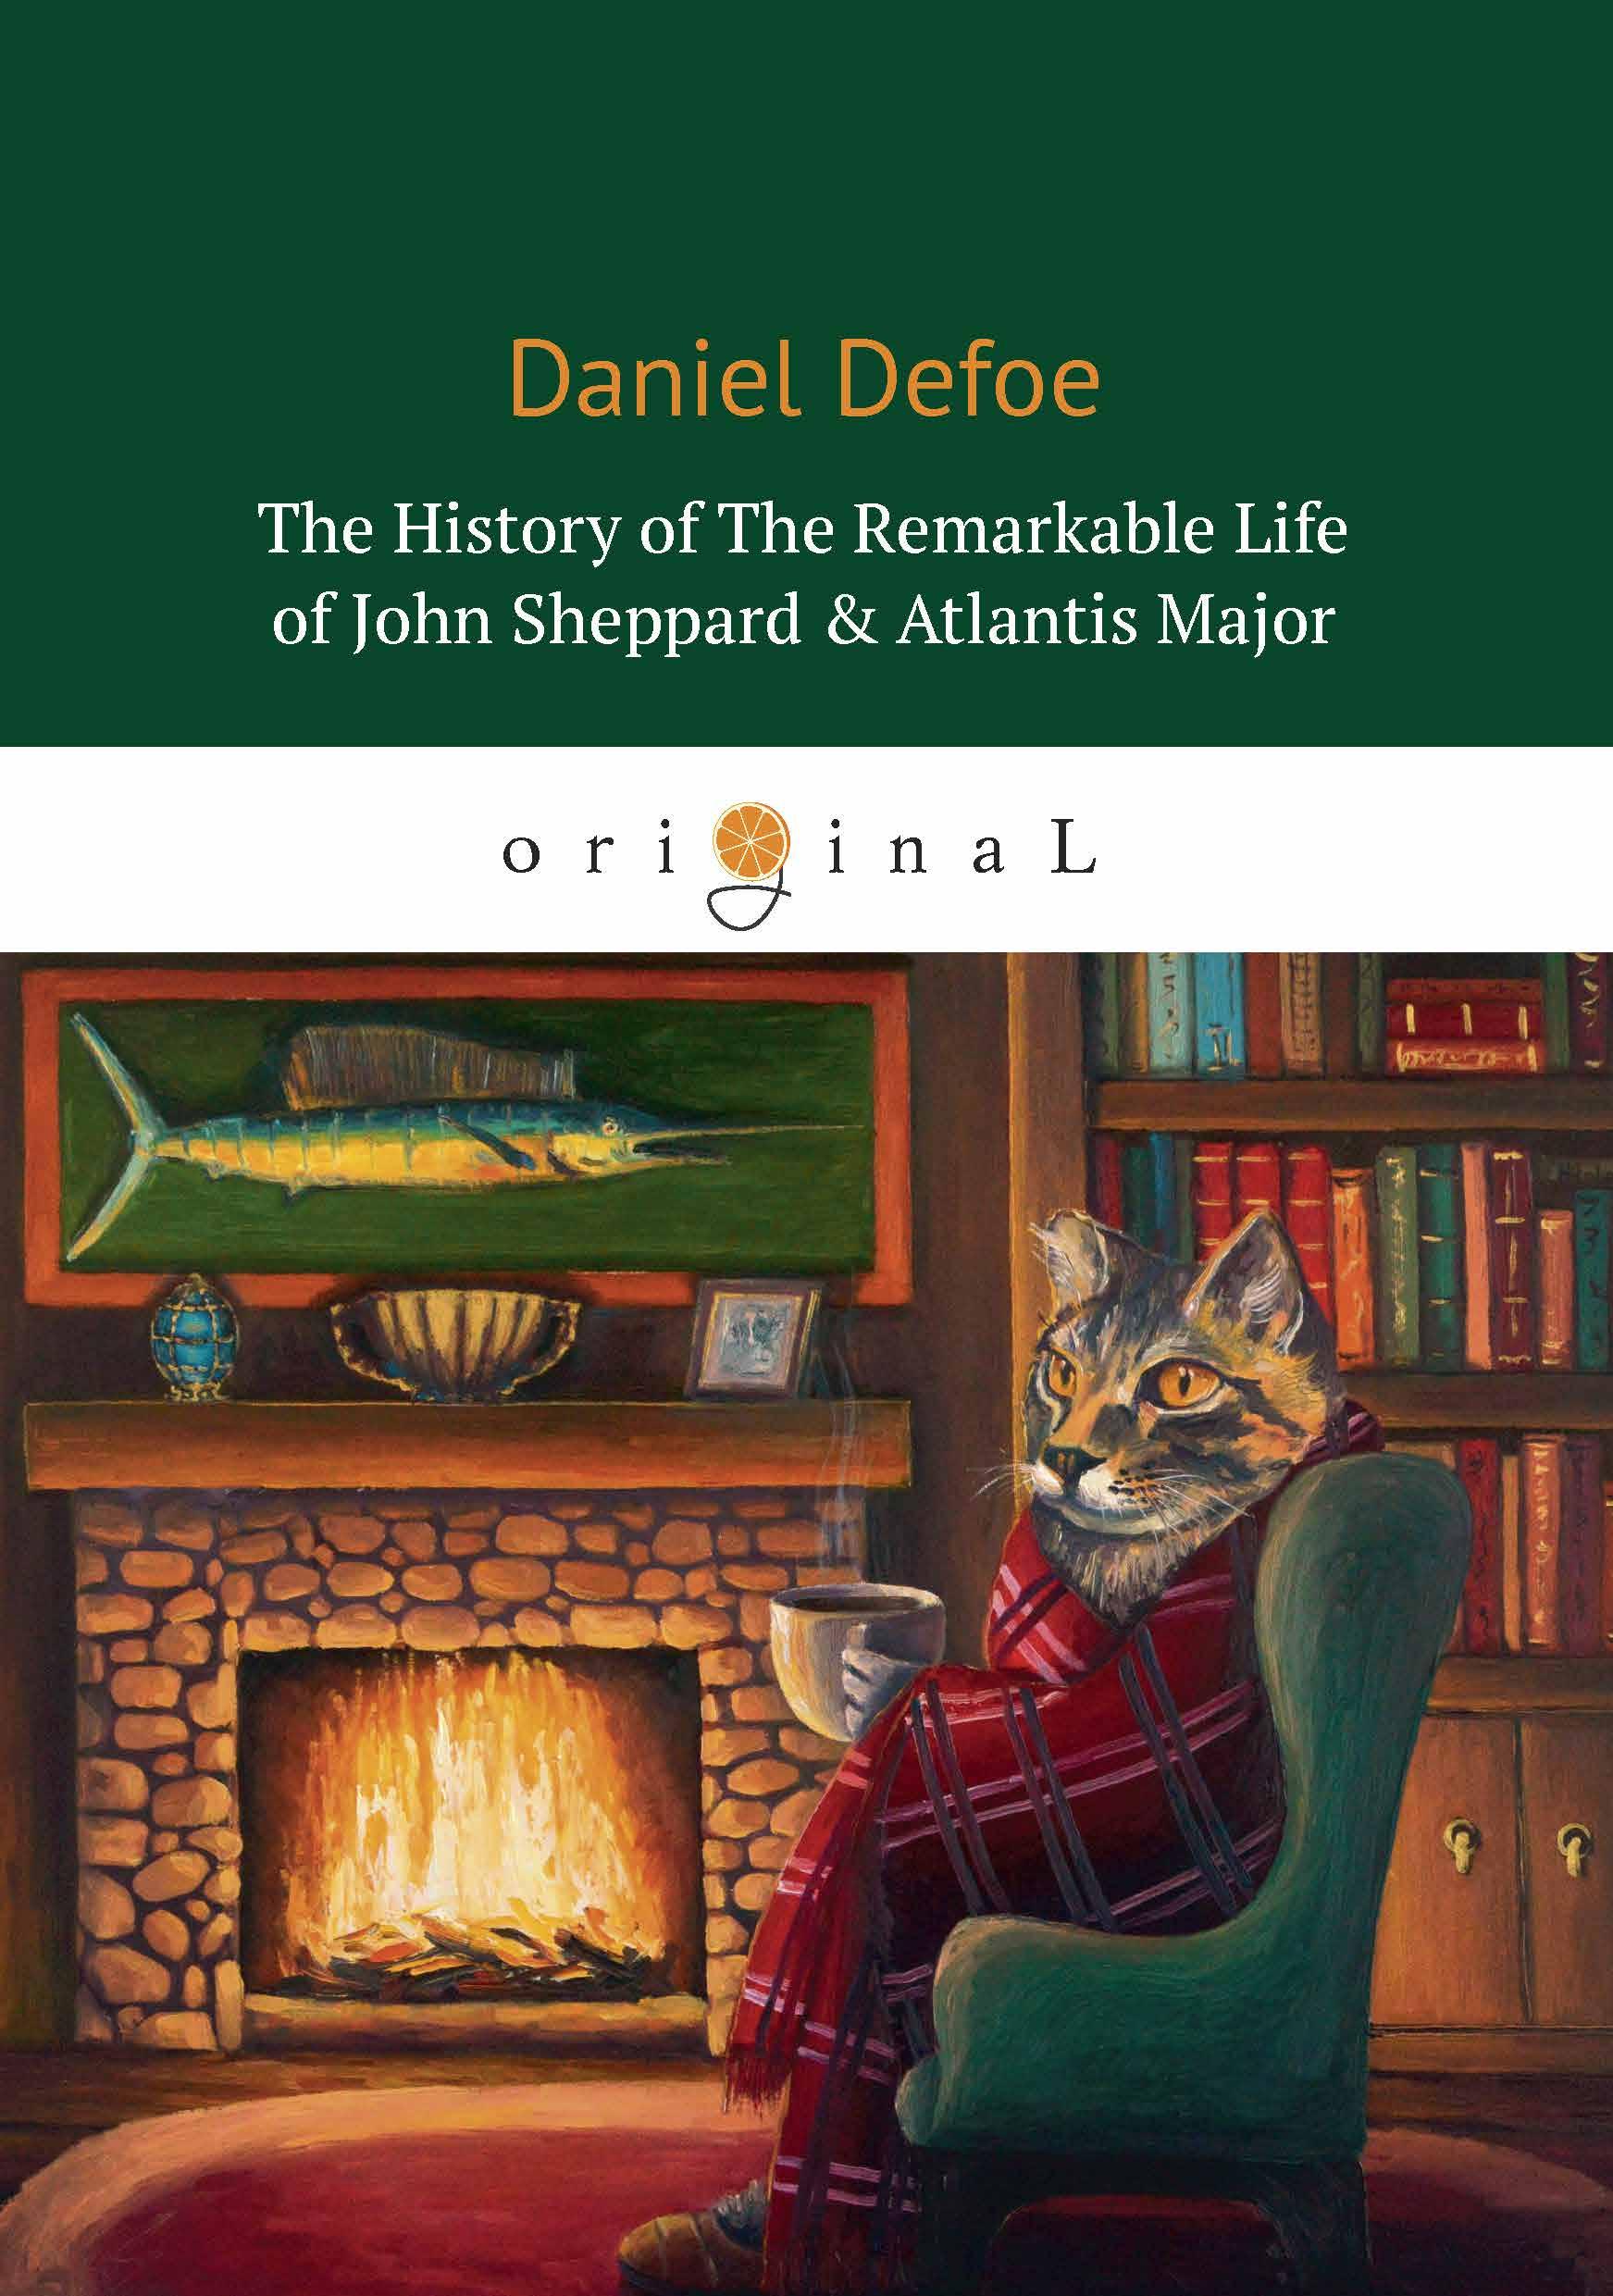 Daniel Defoe The History of the Remarkable Life of John Sheppard & Atlantis Majo даниэль дефо the history of the remarkable life of john sheppard